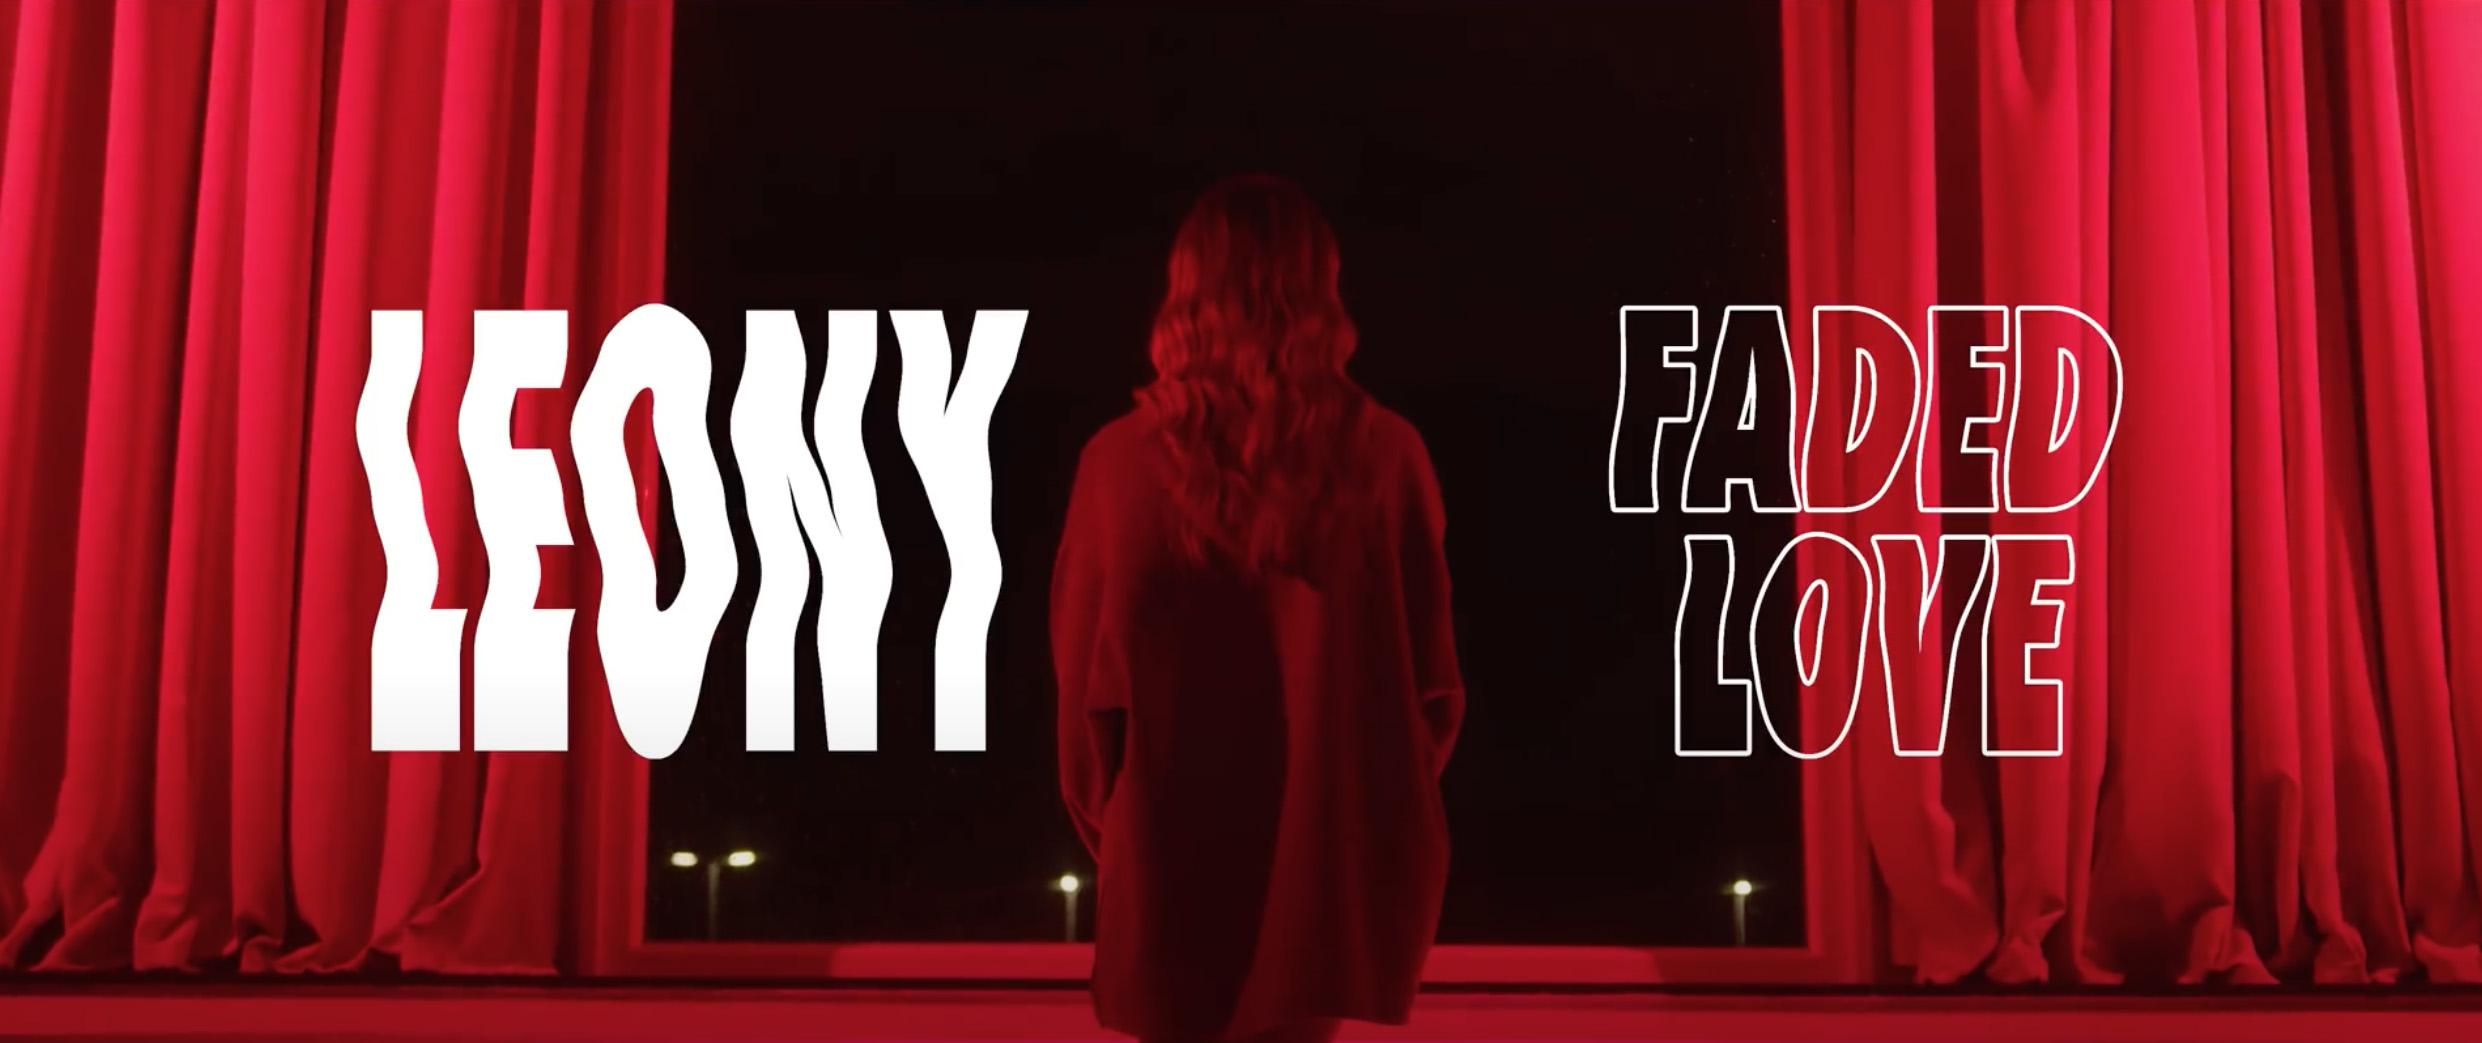 A German pop singer Lenoy's music video